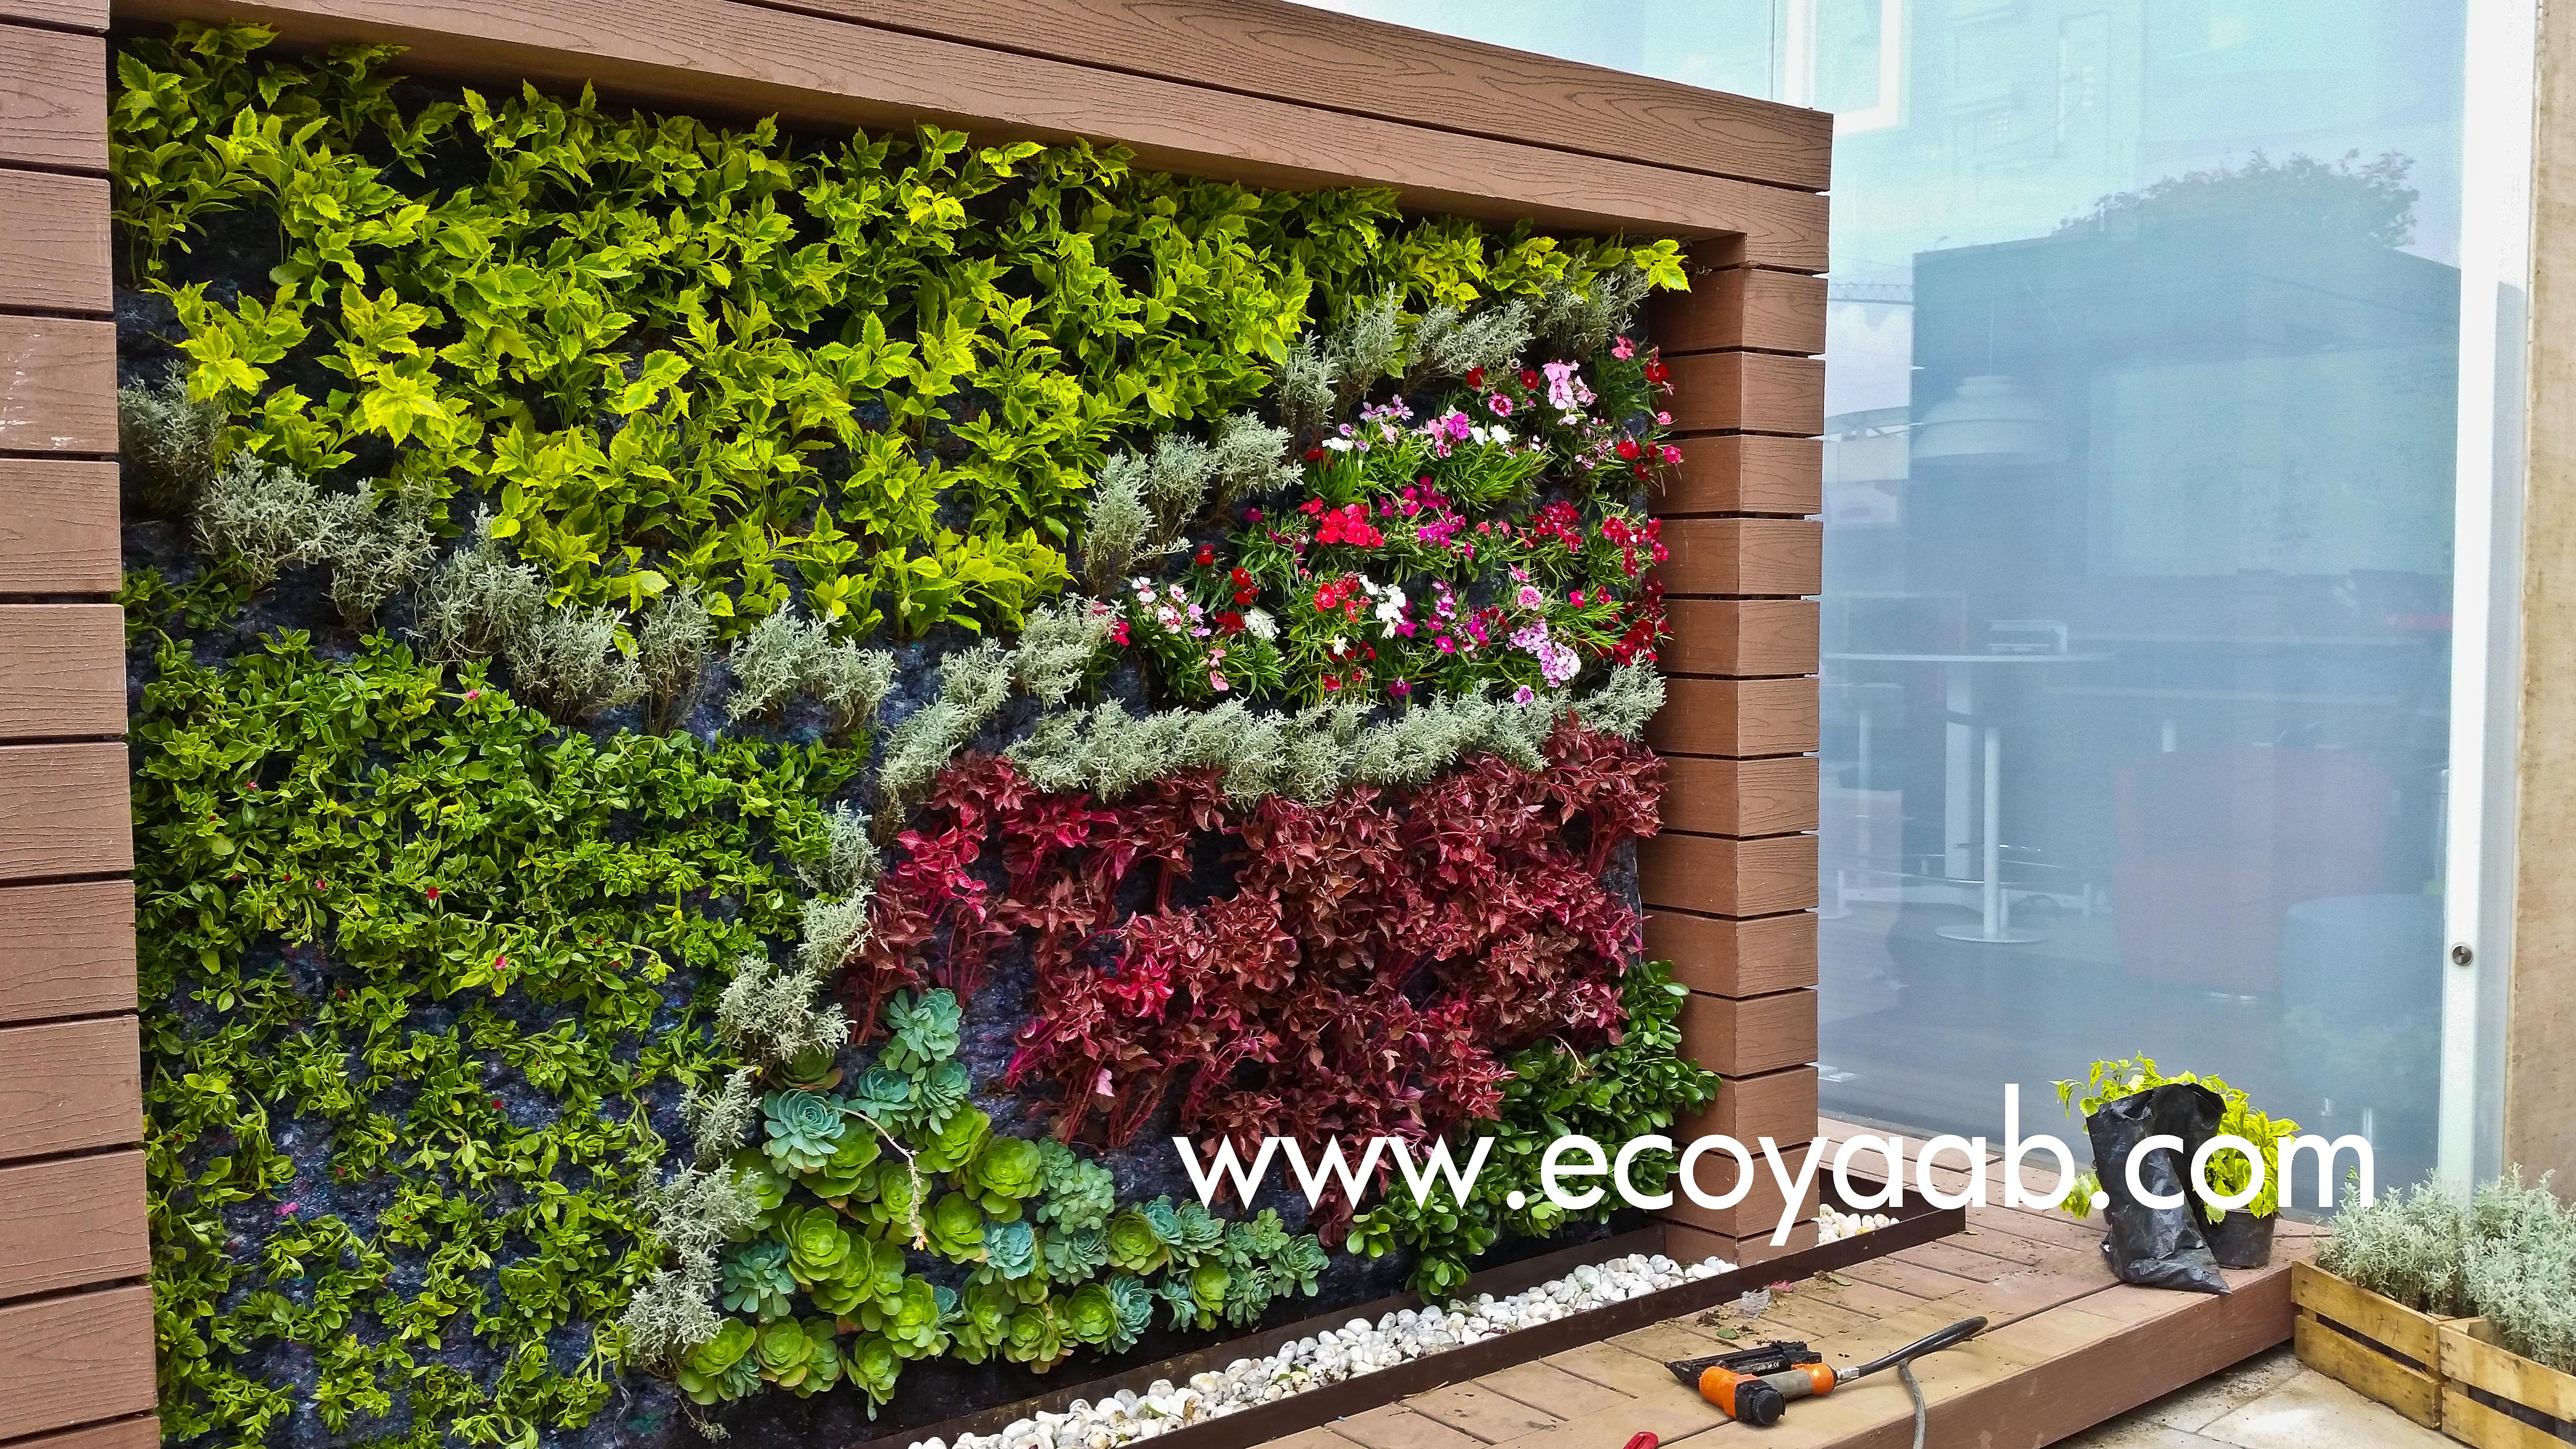 Jardin vertical muro verde nico en m xico dise os for Muros verdes arquitectura